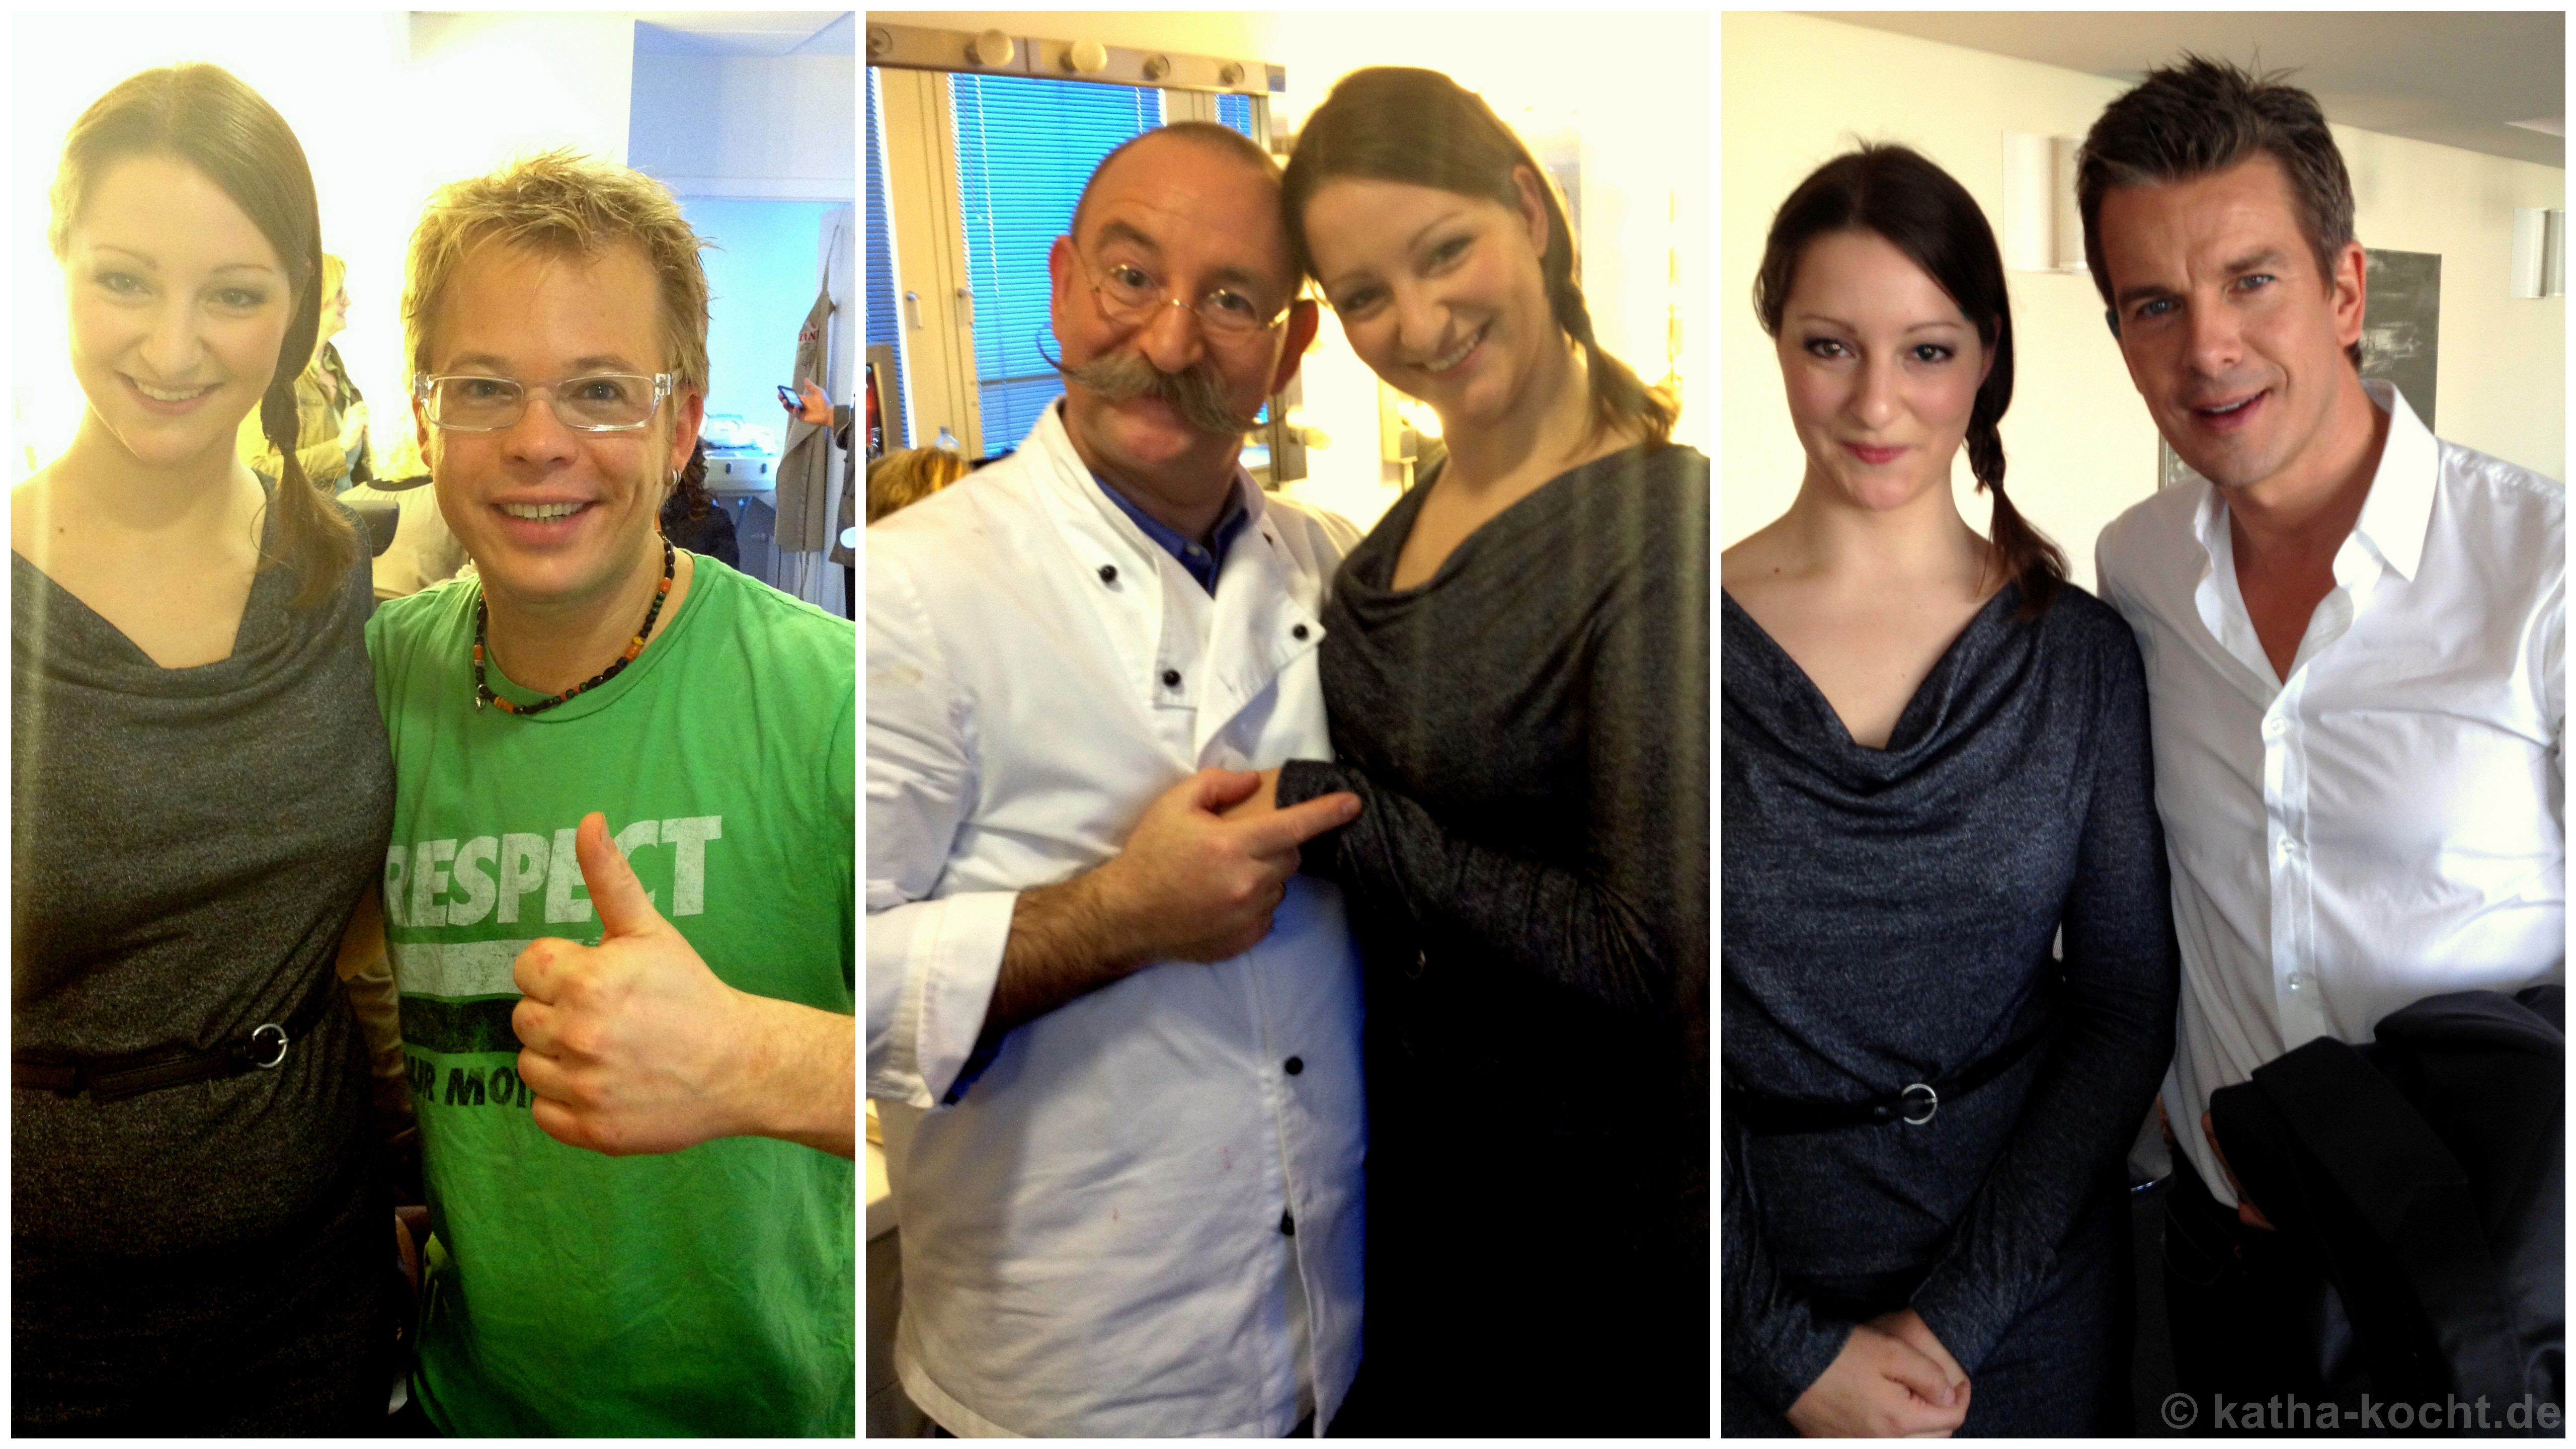 Kategorie: Küchenschlacht - Katha-kocht!